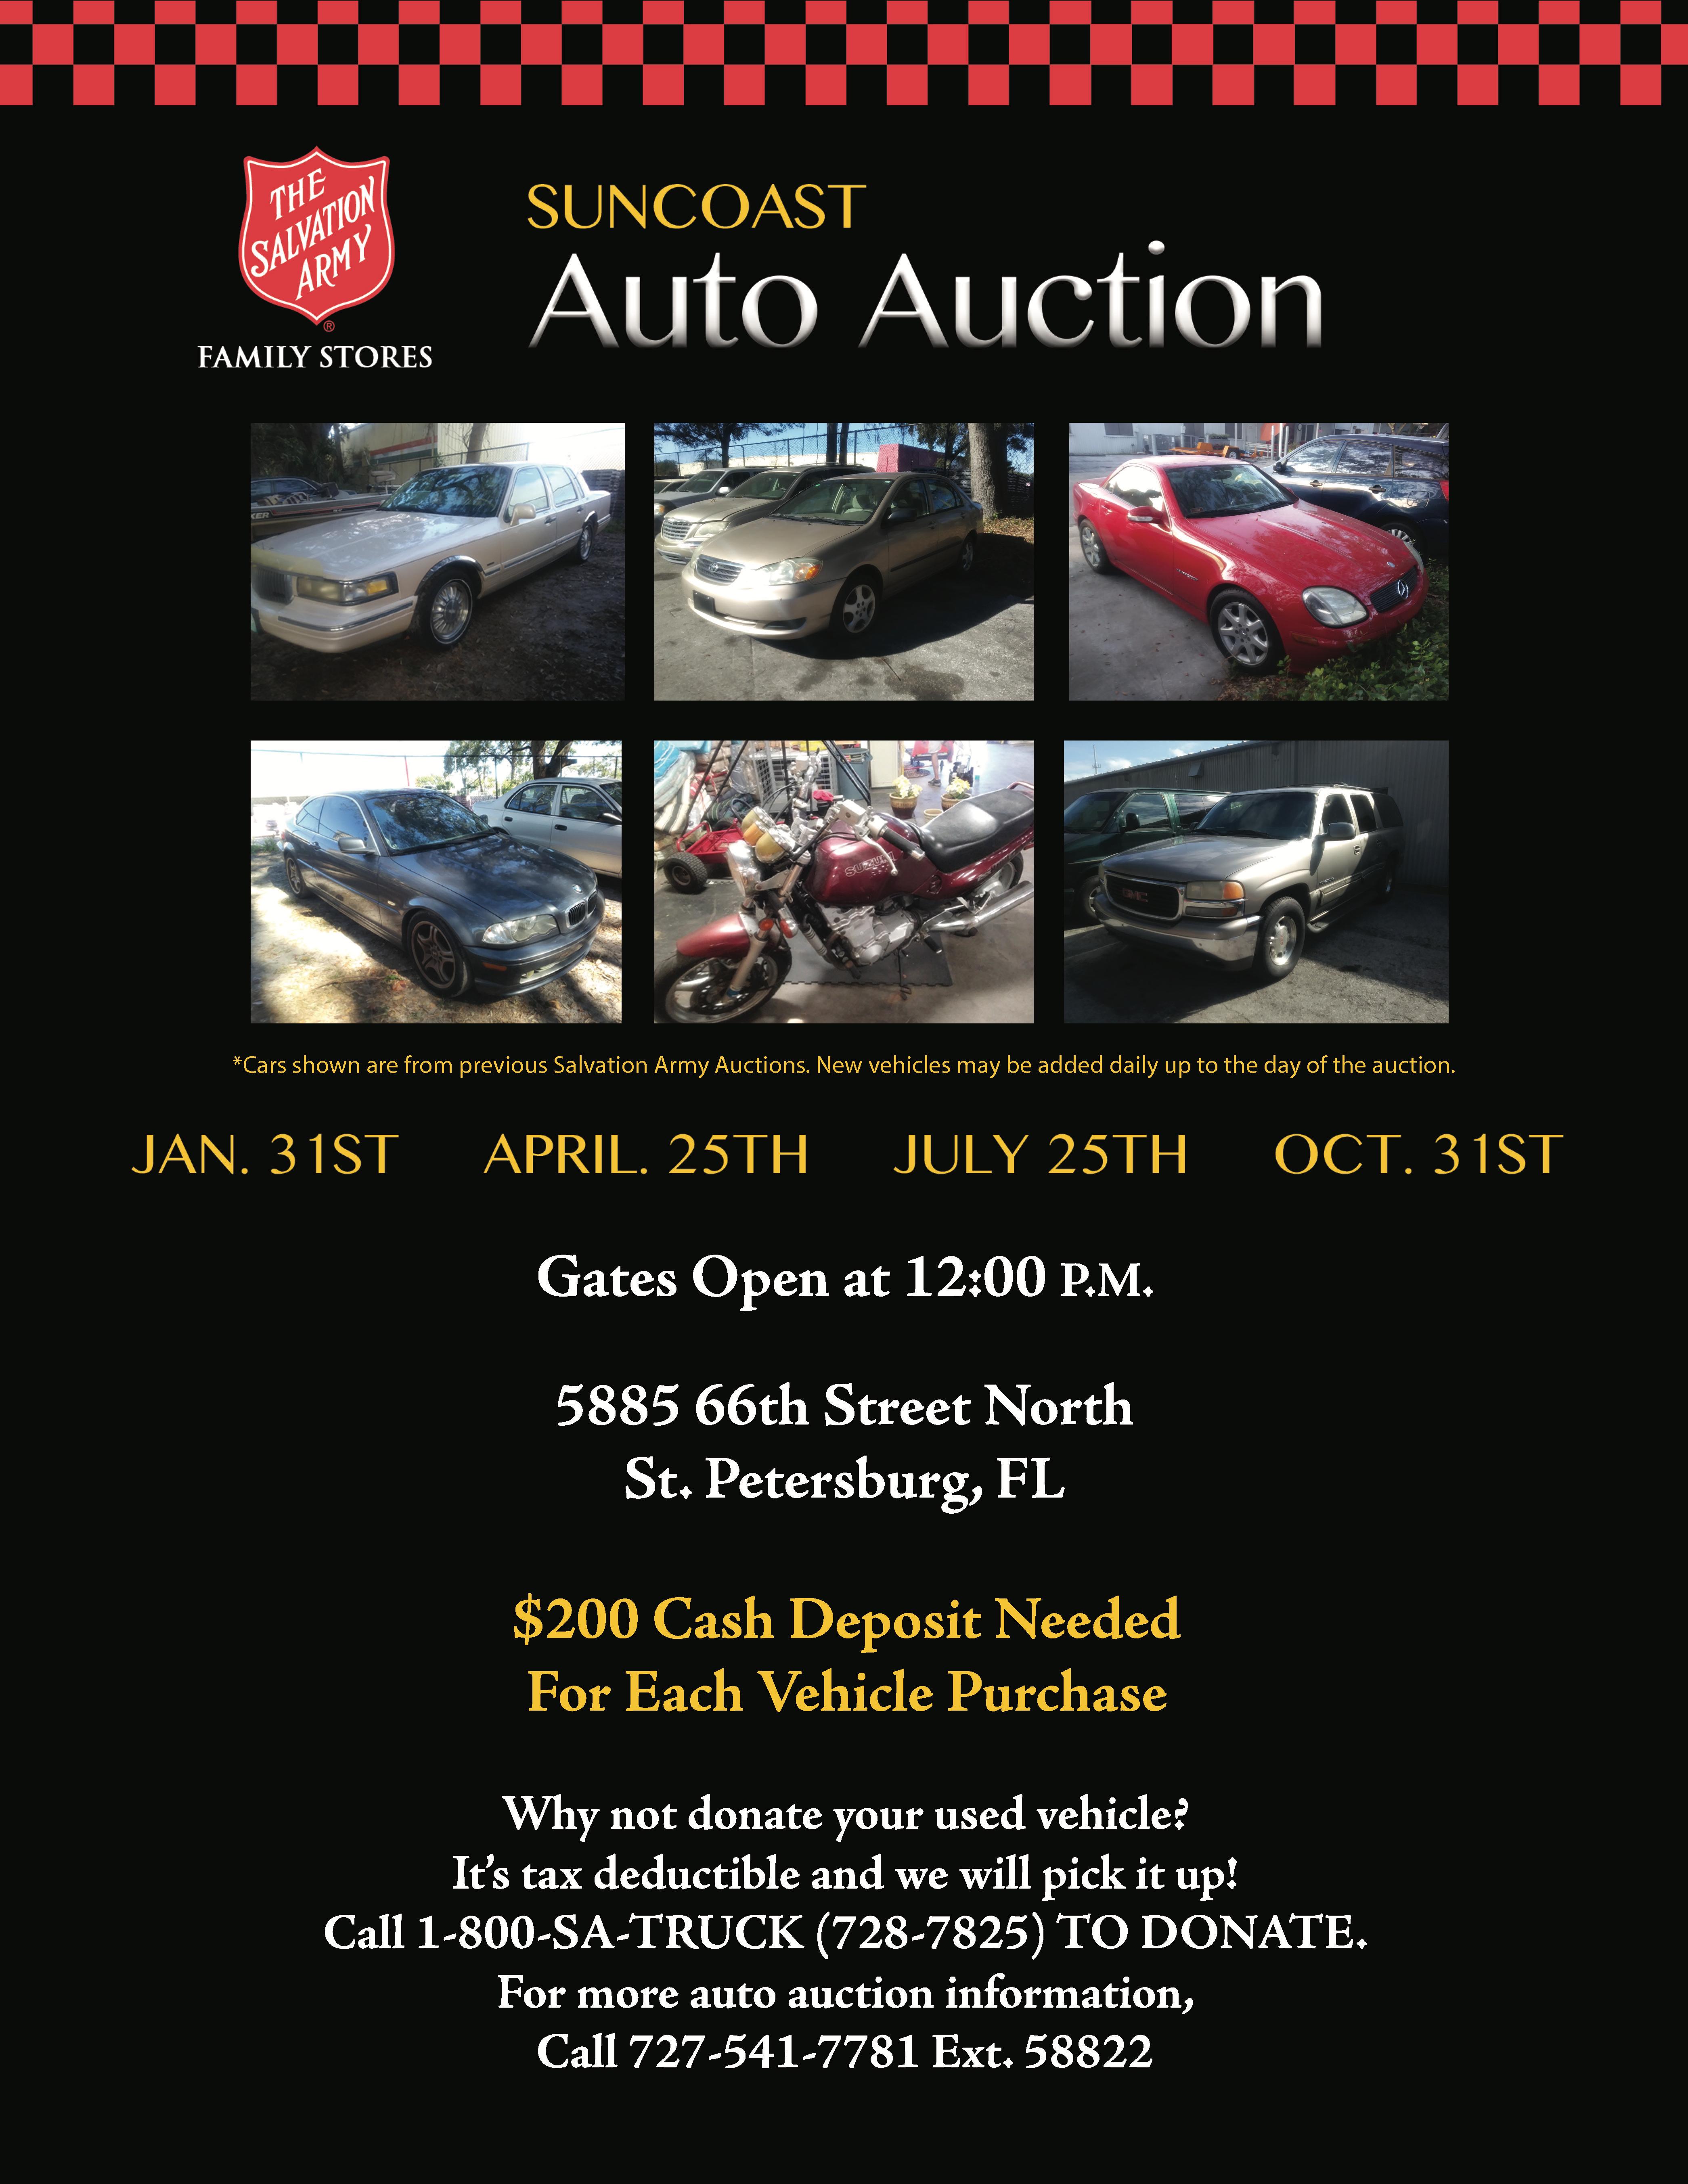 St.Petersburg Salvation Army Auto Auction